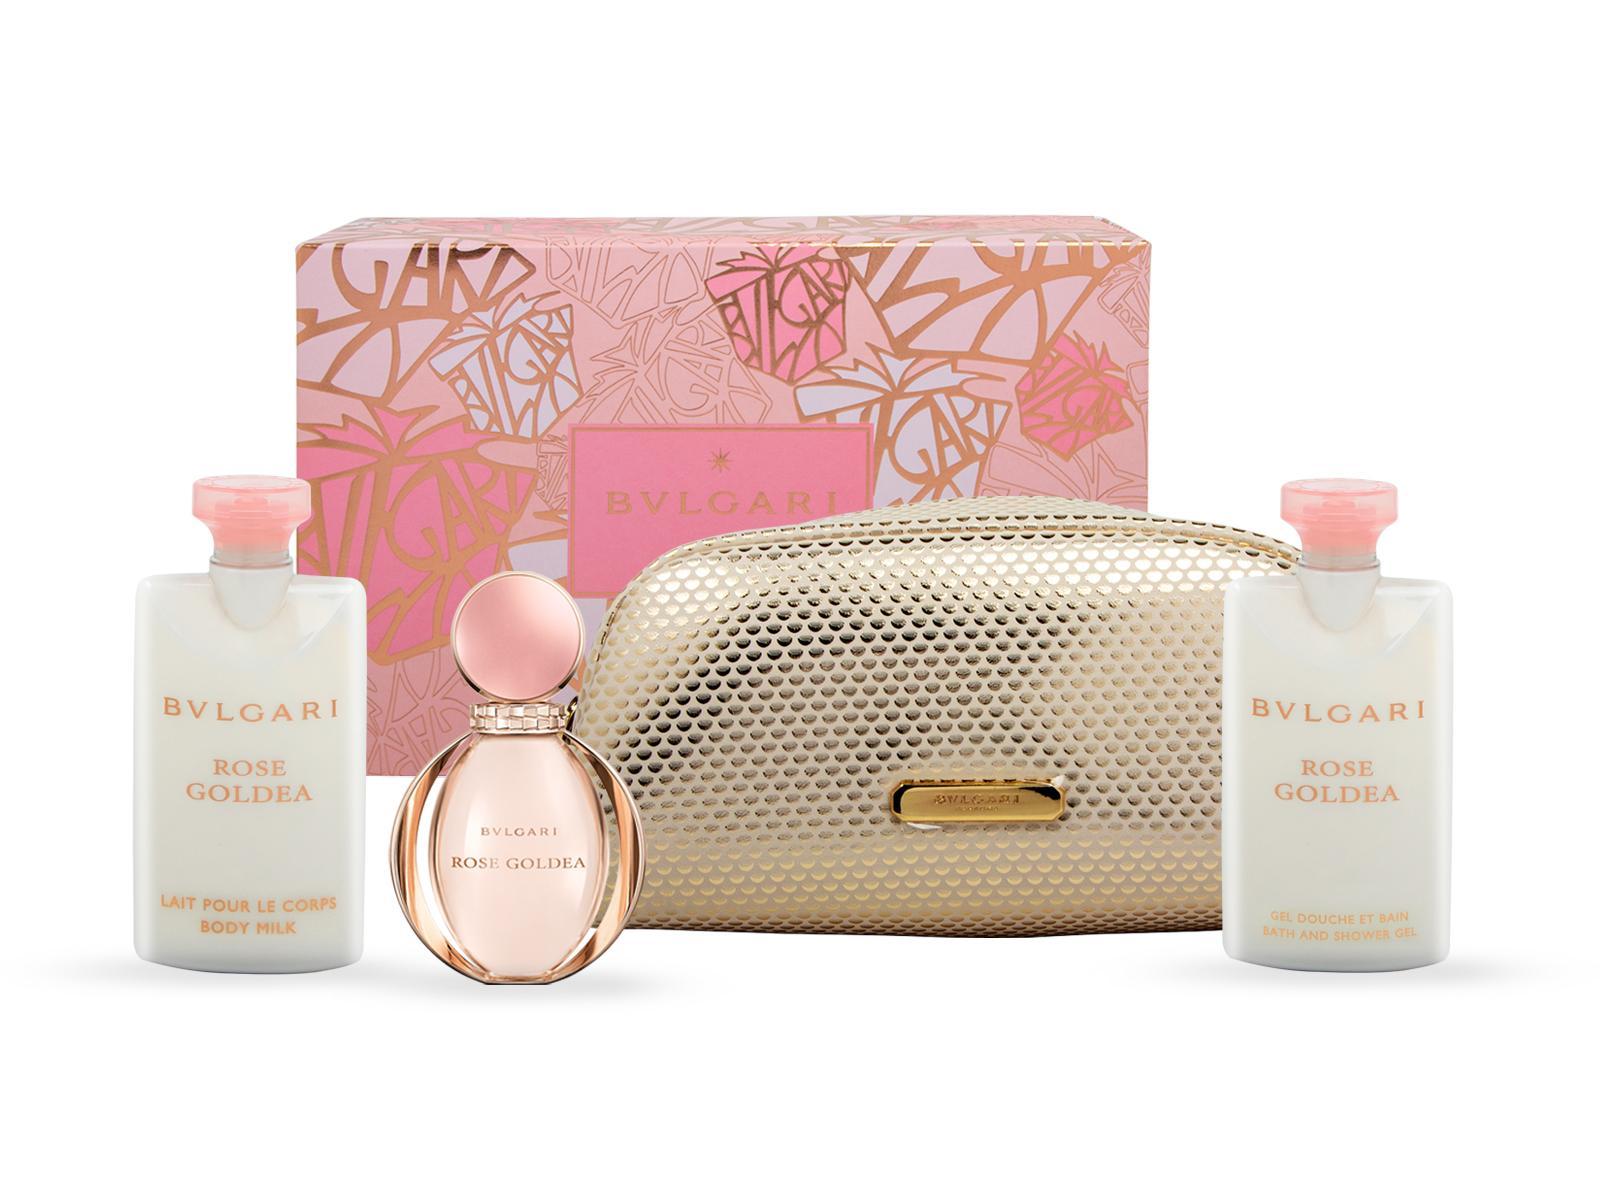 Bvlgari Rose Goldea For Women Eau De Parfum 90ML Set